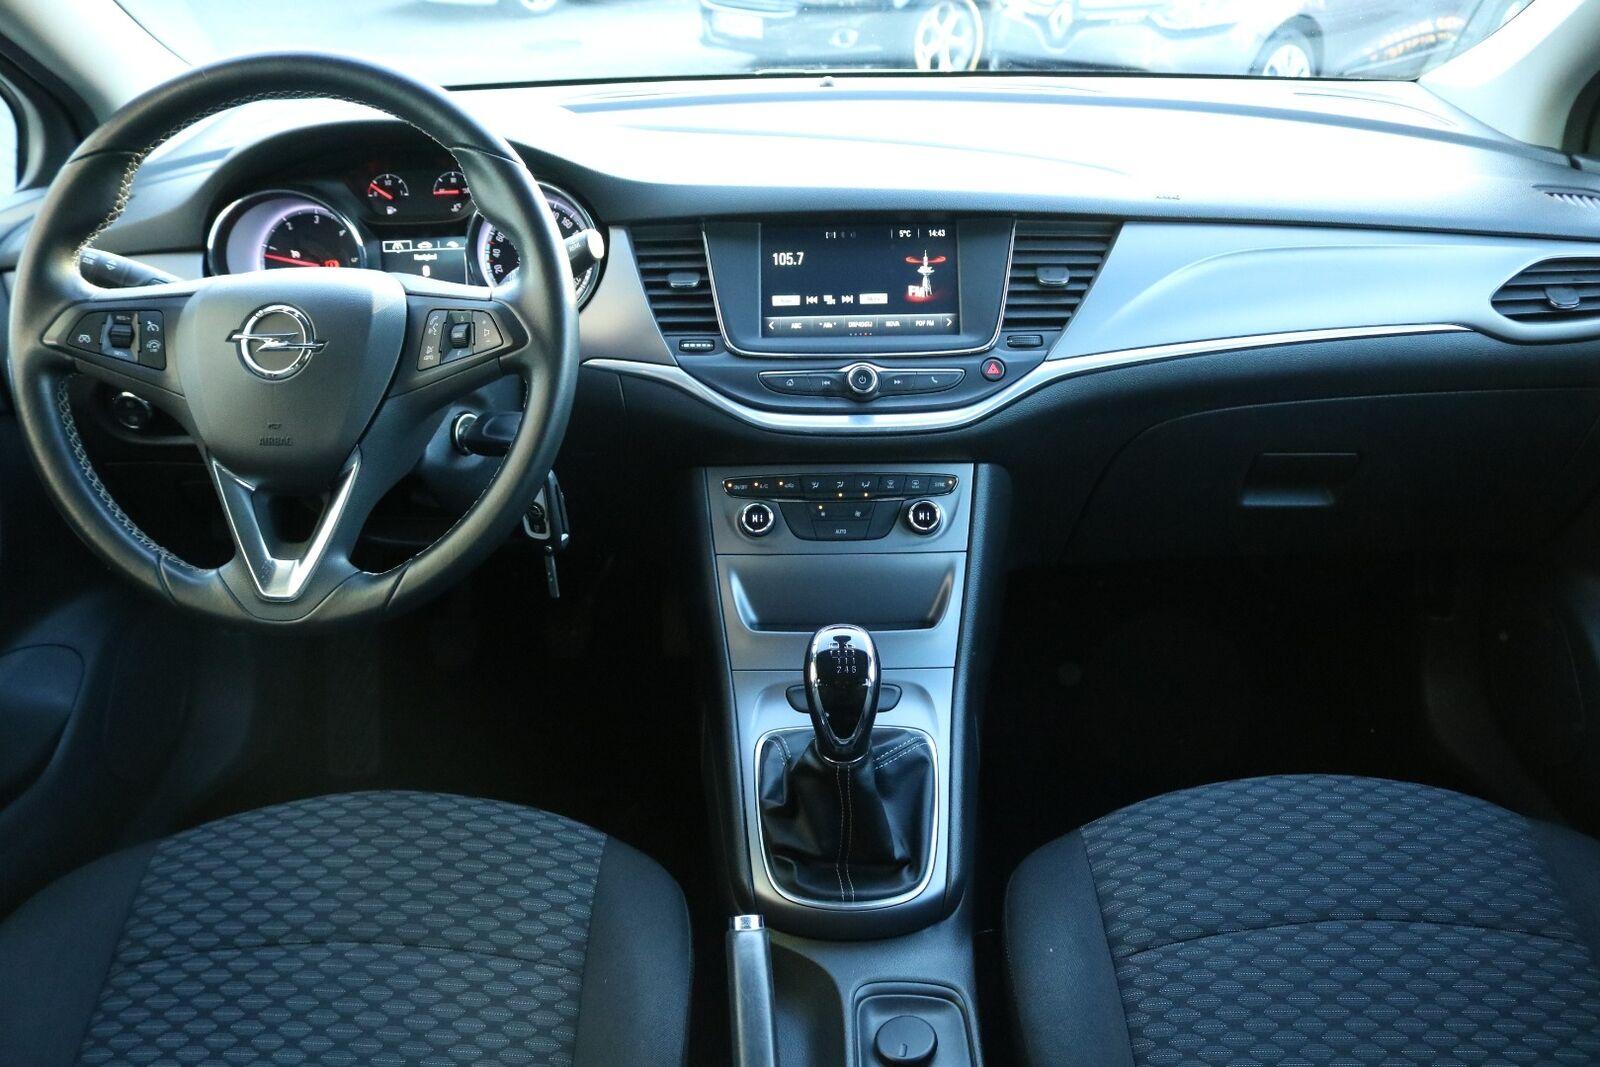 Opel Astra CDTi 110 Sport ST eco